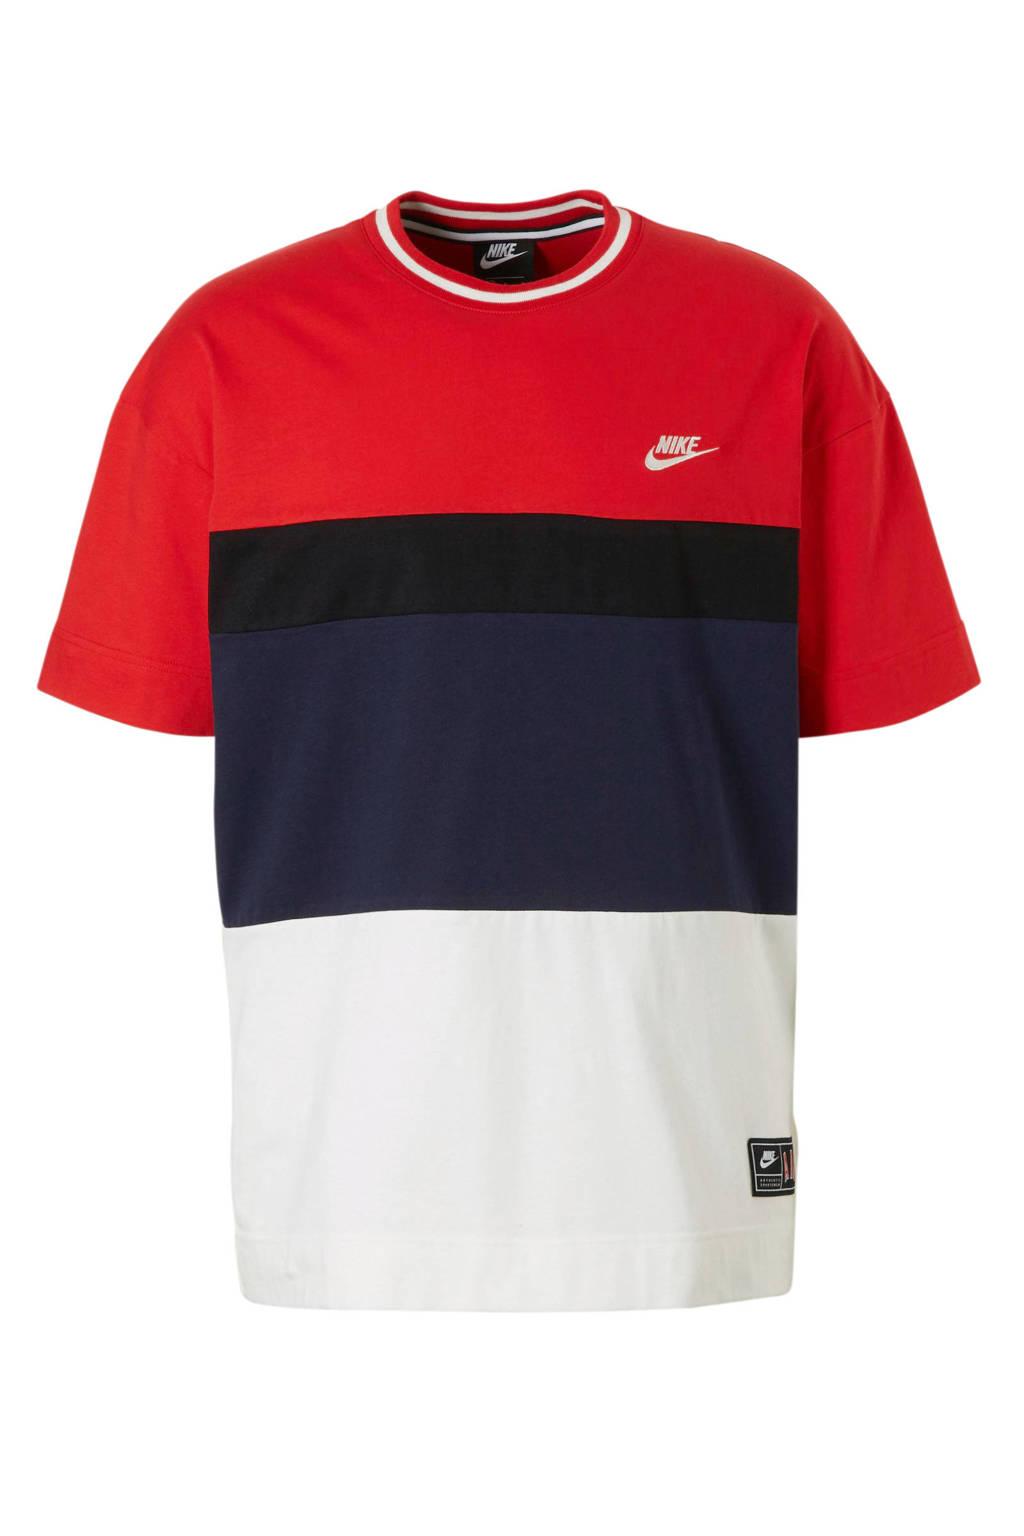 Nike   sport T-shirt, Rood/zwart/donkerblauw/wit